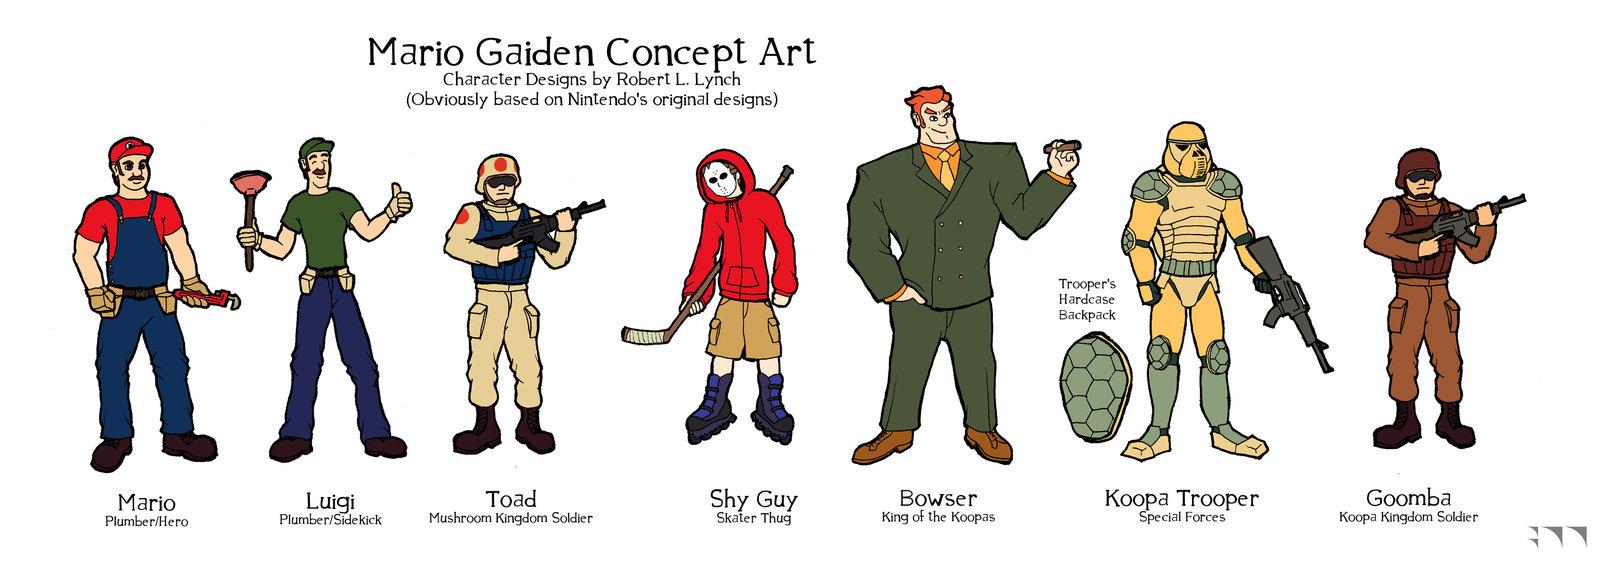 Mario Gaiden Character Designs - 2009